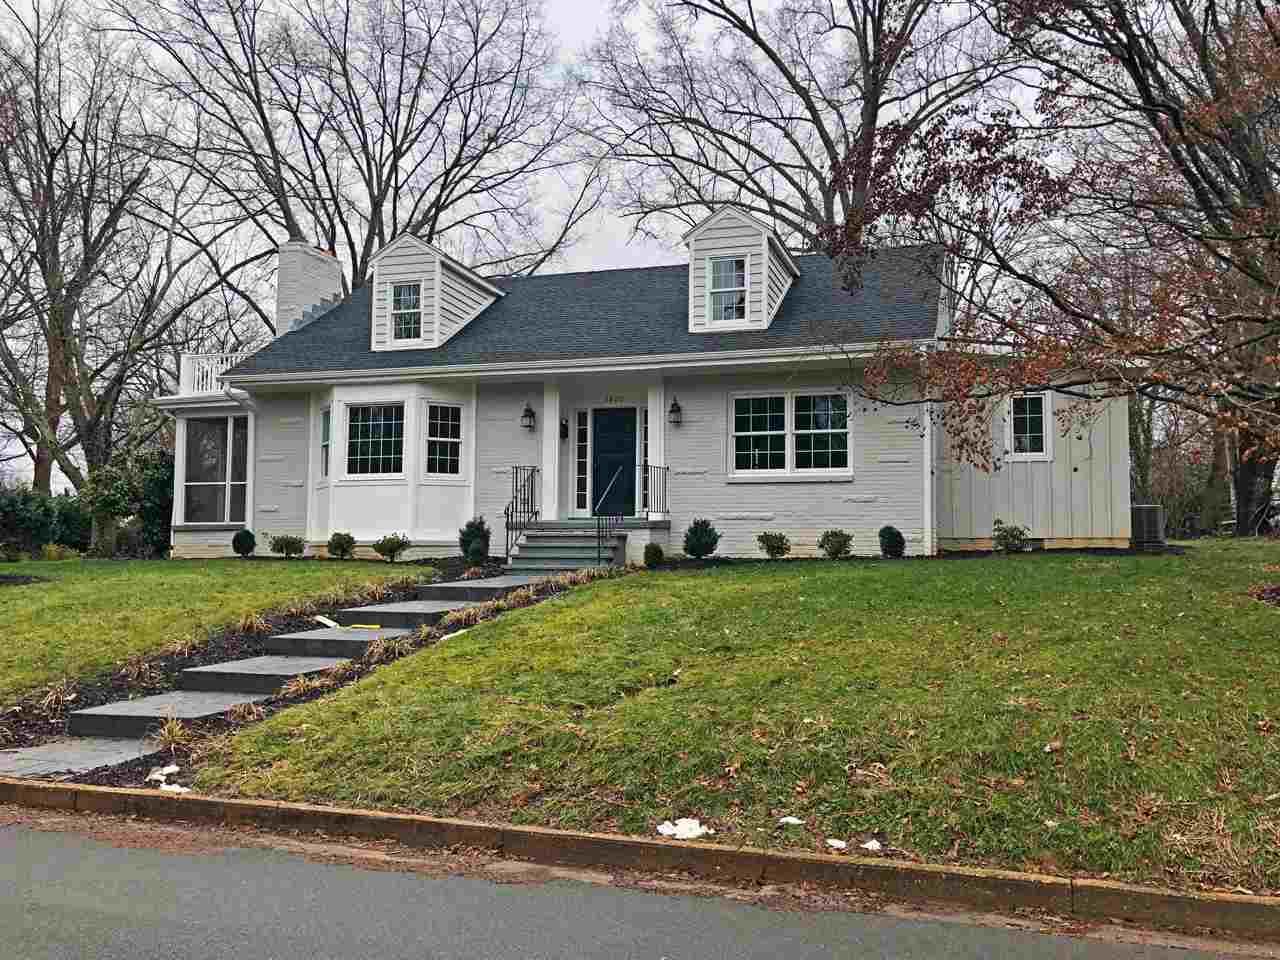 Mls 586422 1600 oxford rd charlottesville va 22903 - Bathroom remodeling charlottesville va ...